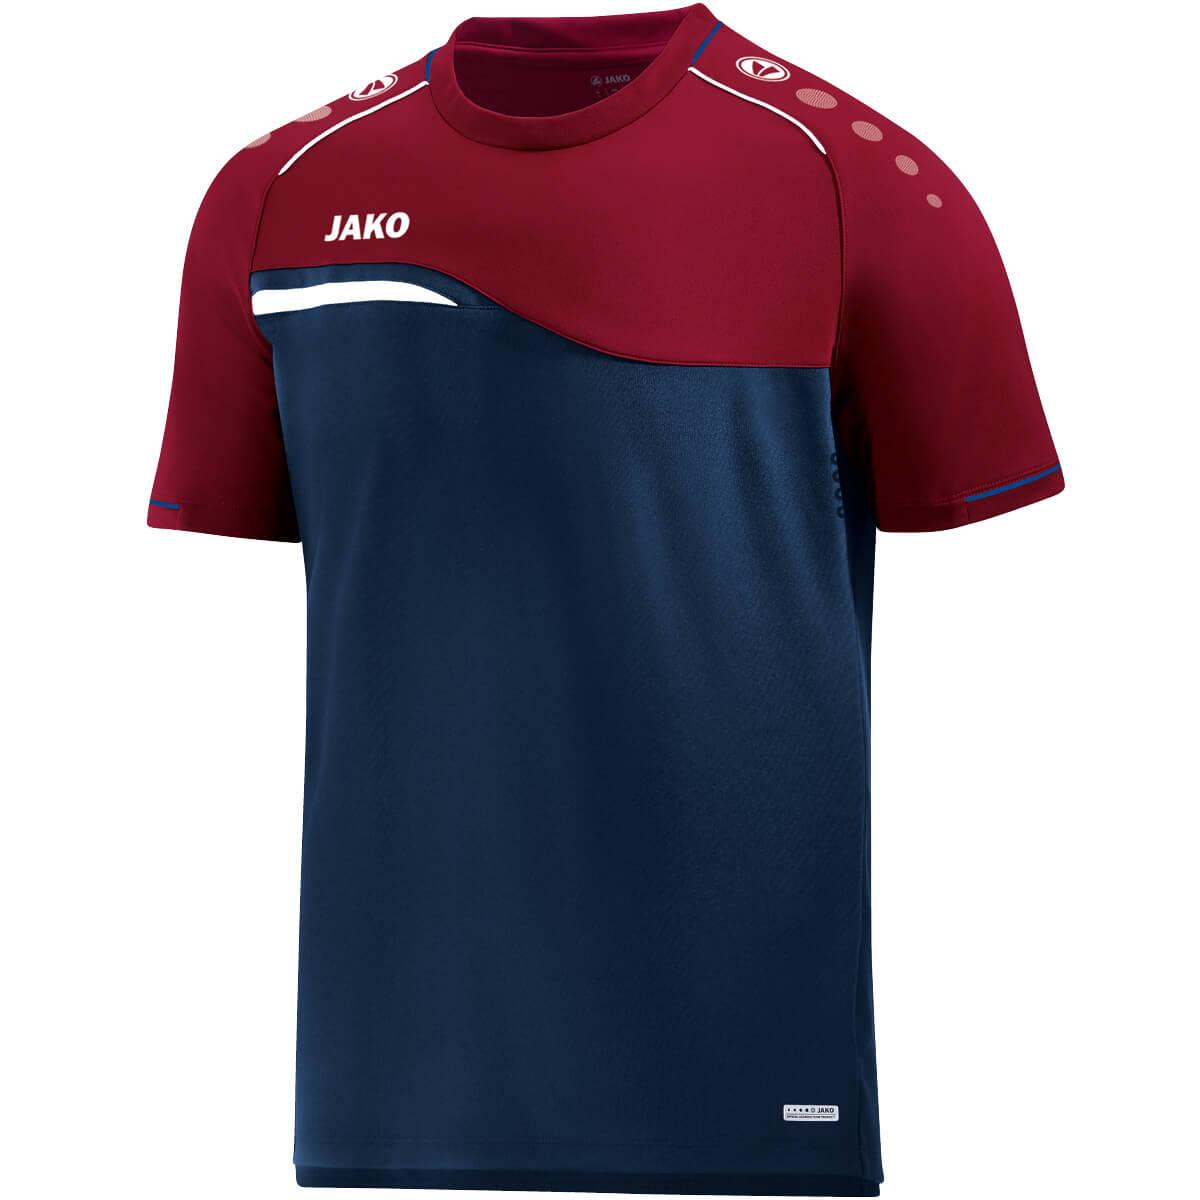 T-Shirt Competition 2.0 - Frauen | Jako 6118